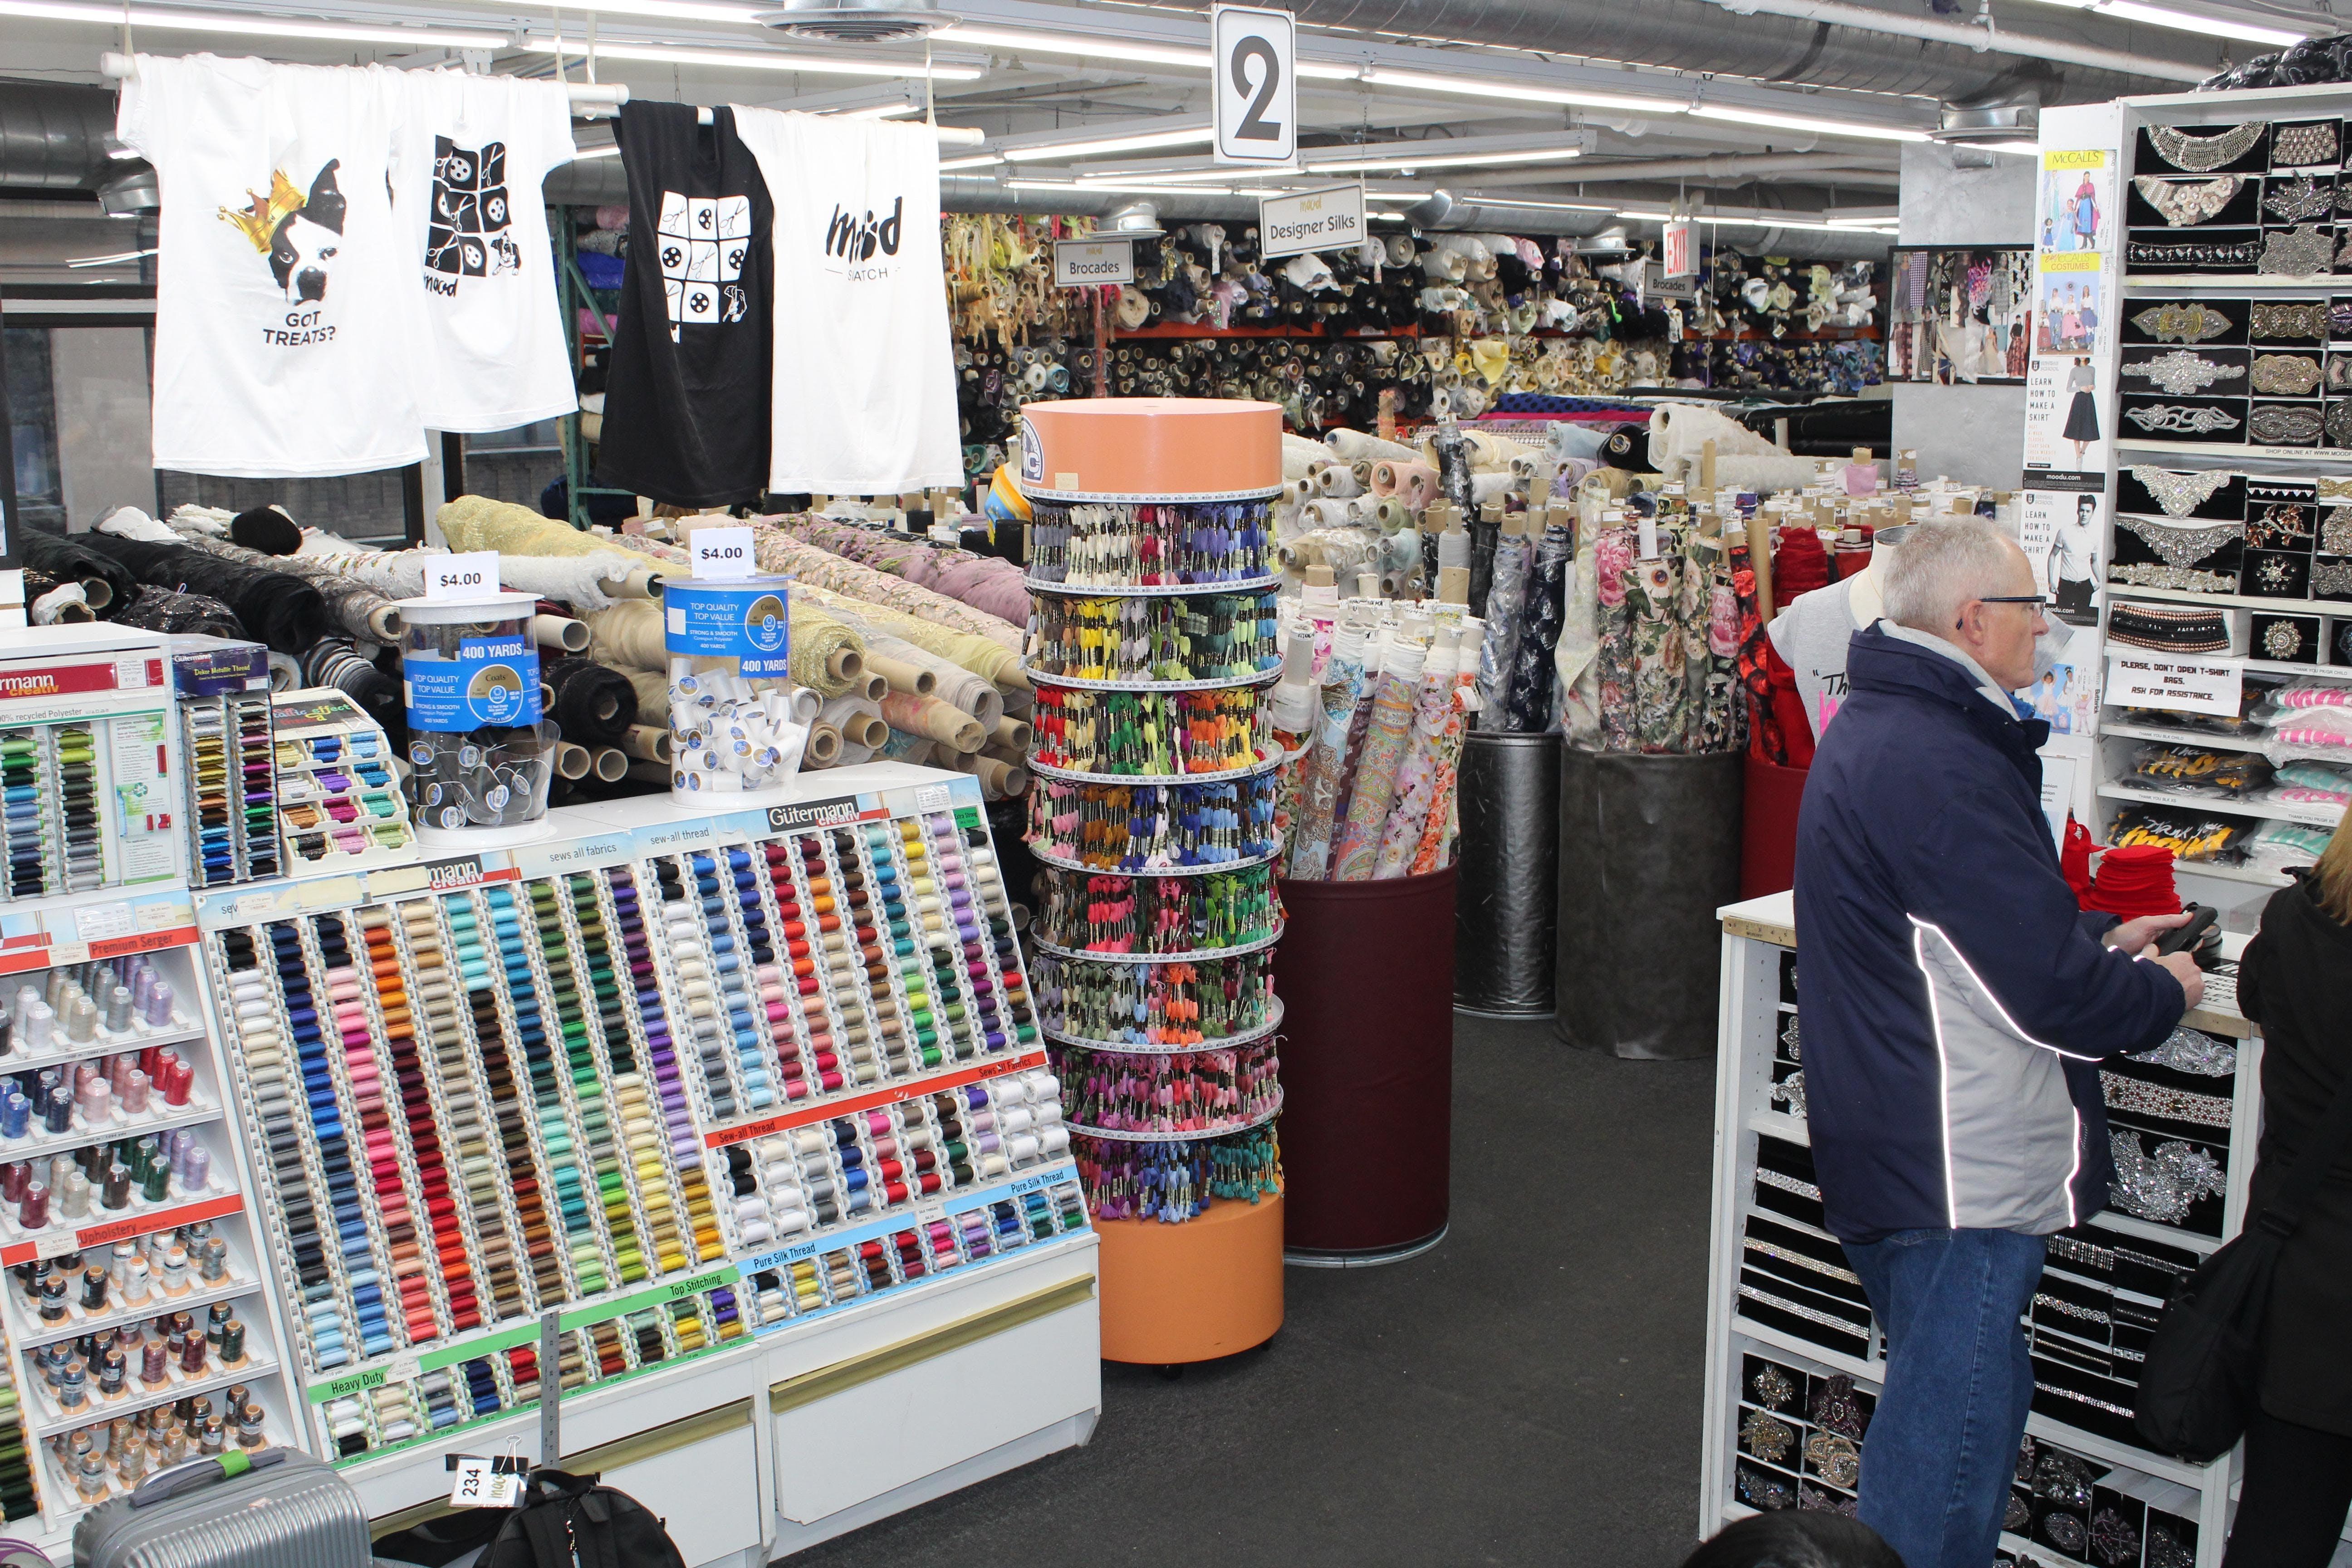 Mood Fabrics - WEAR 2018 at 225 West 37th Street, New York